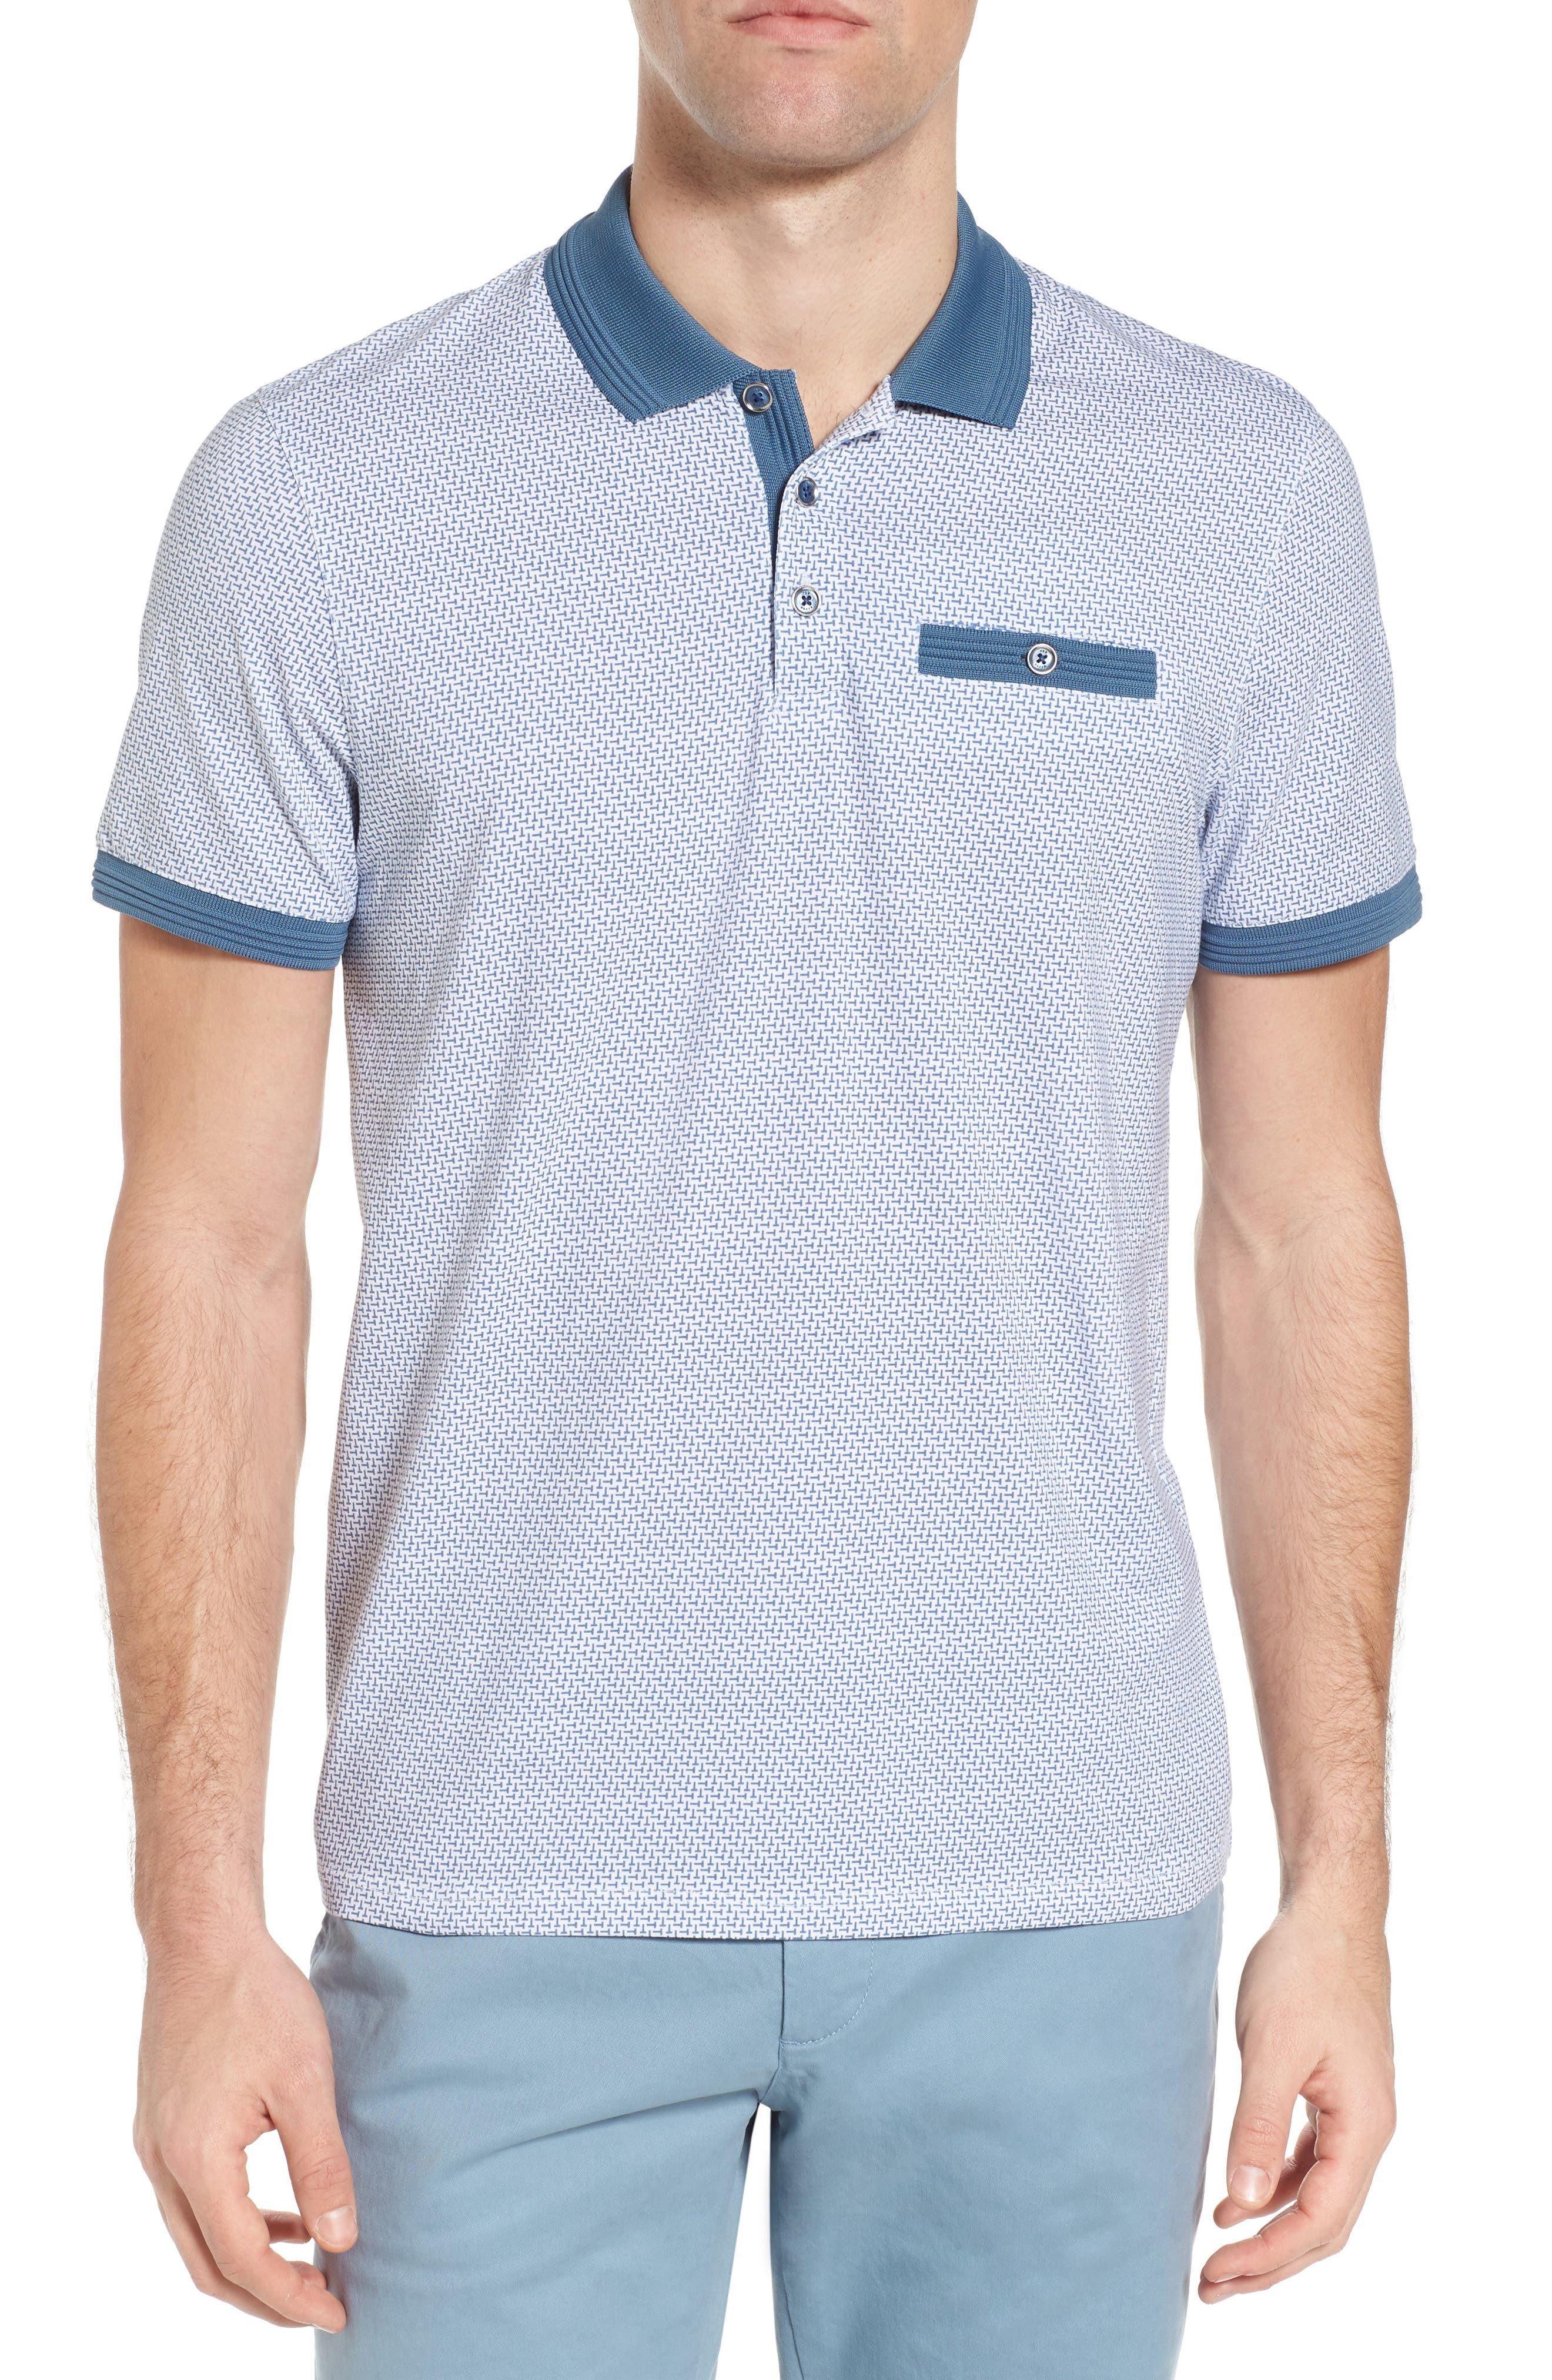 Sloughi Trim Fit Stretch Polo Shirt,                             Main thumbnail 1, color,                             400